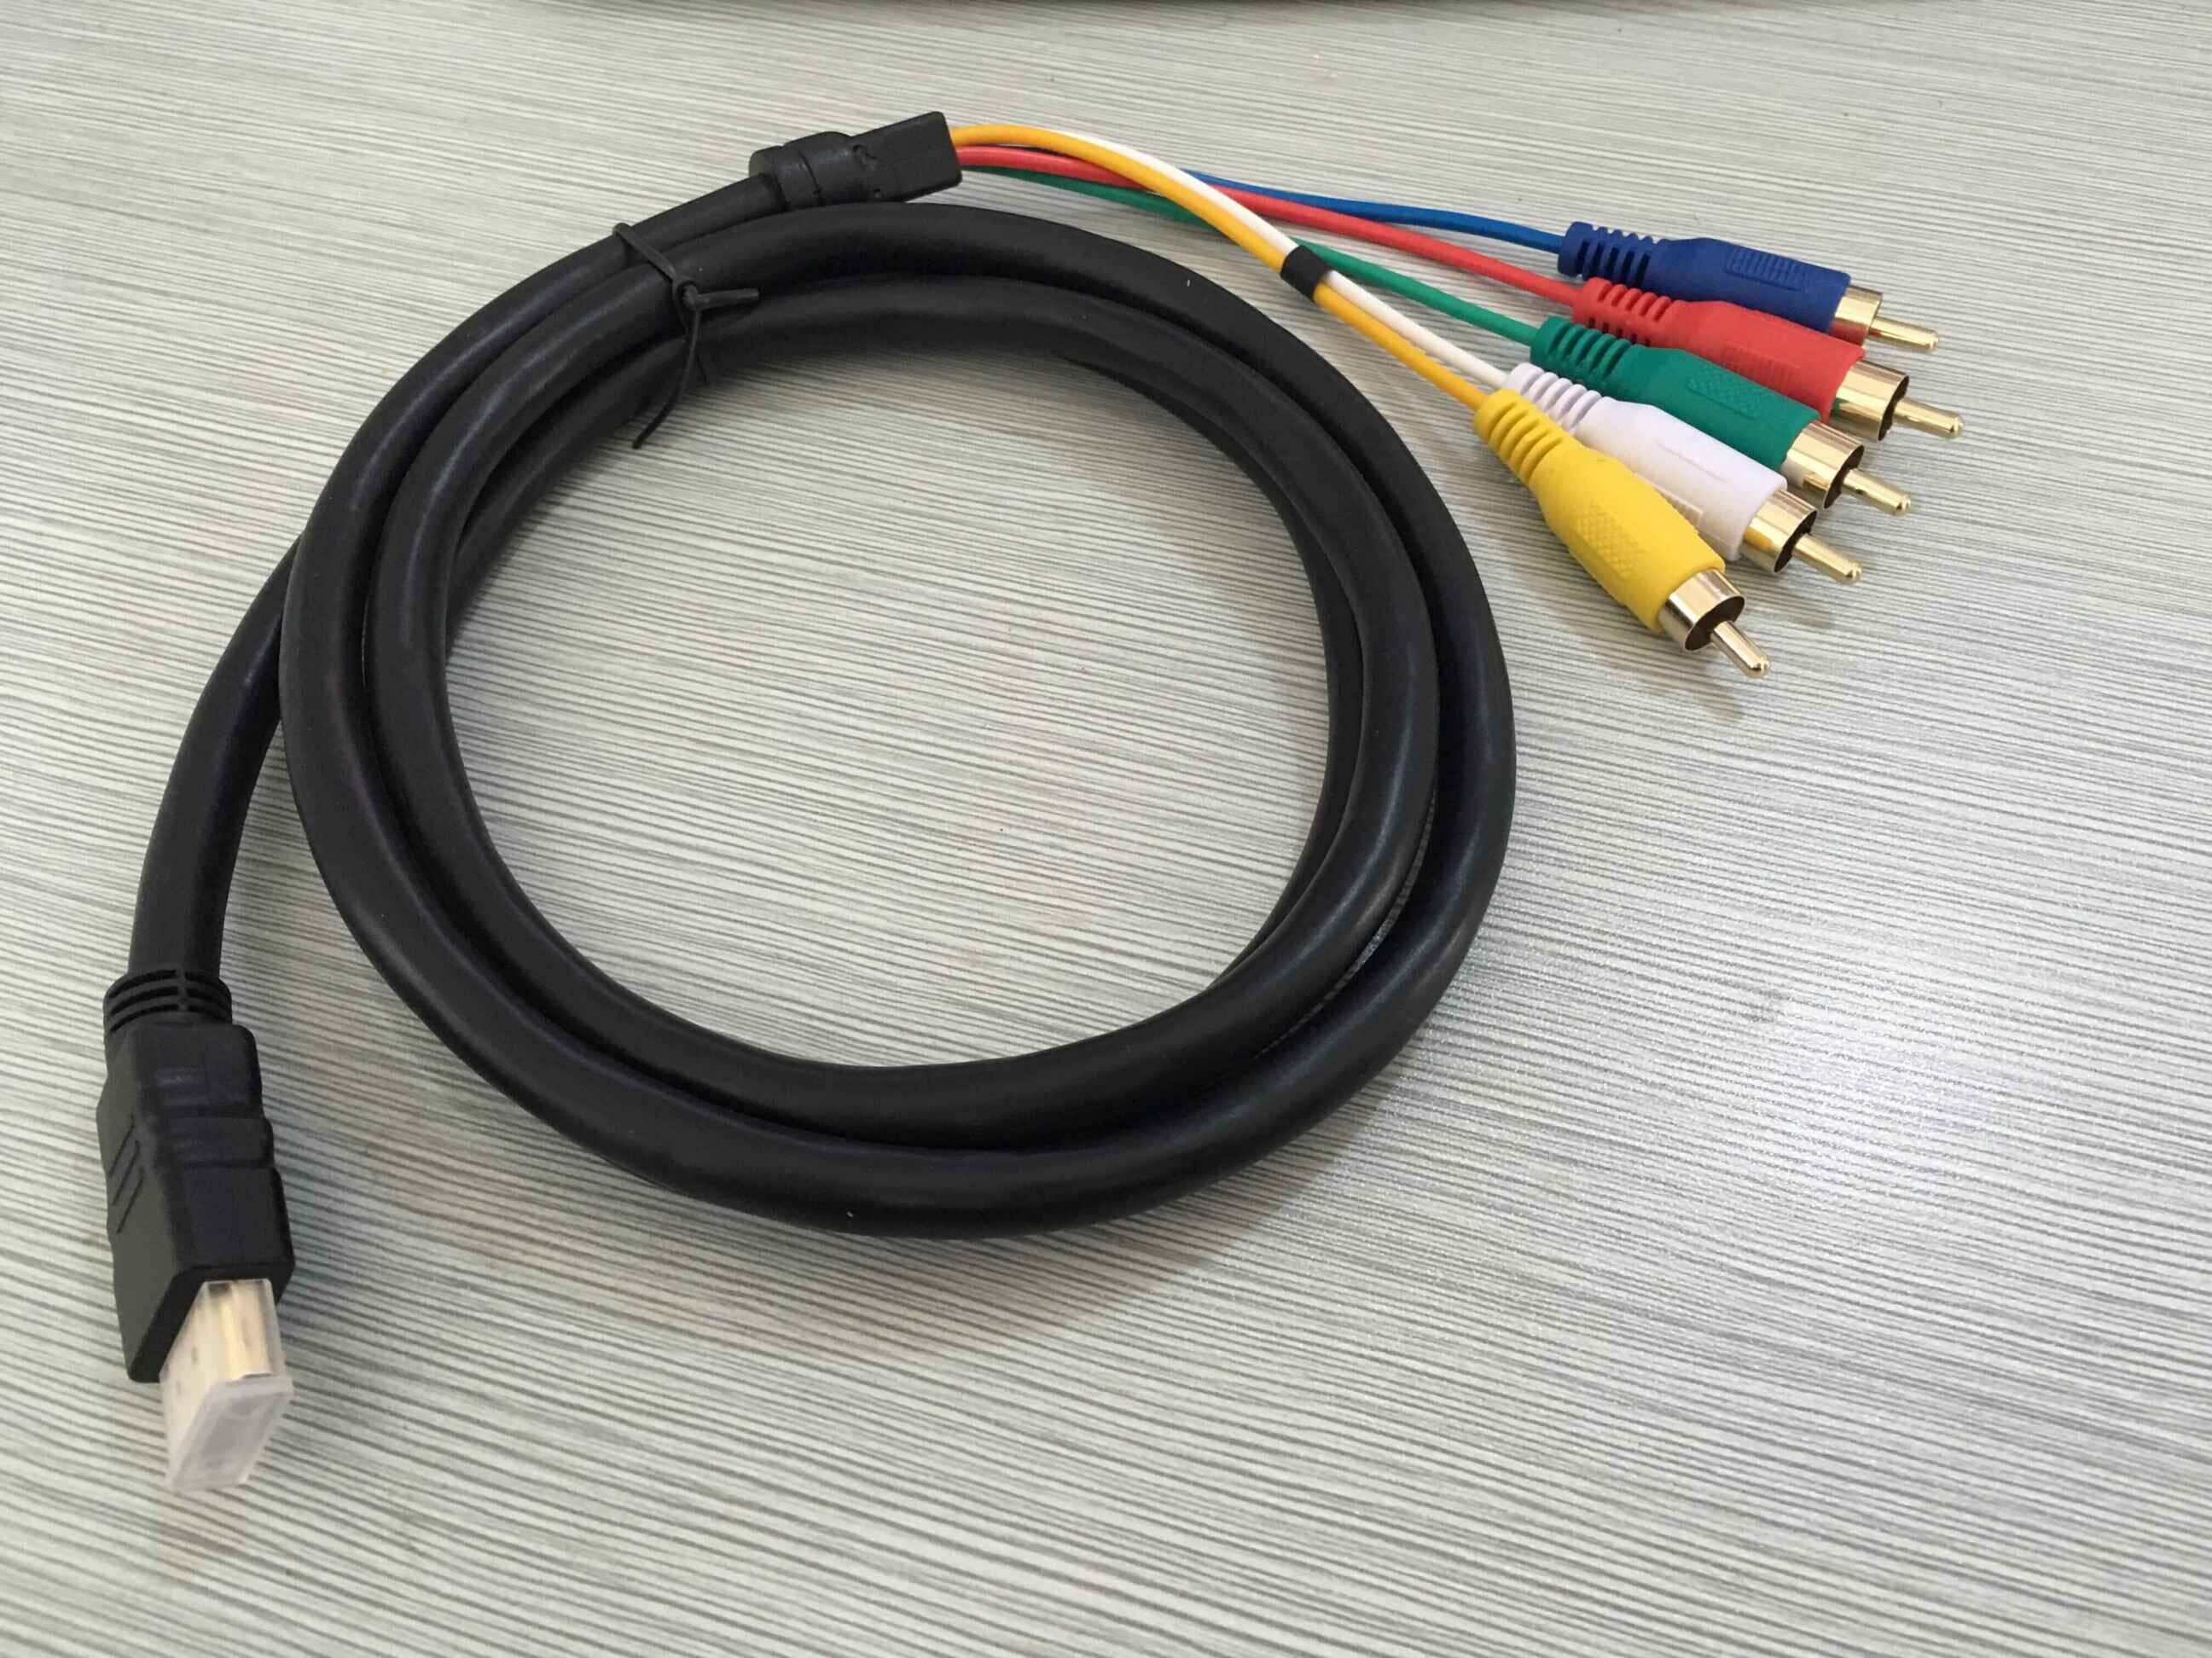 EastVita® 538581 HDMI to 5 RCA Cable, 5-Feet